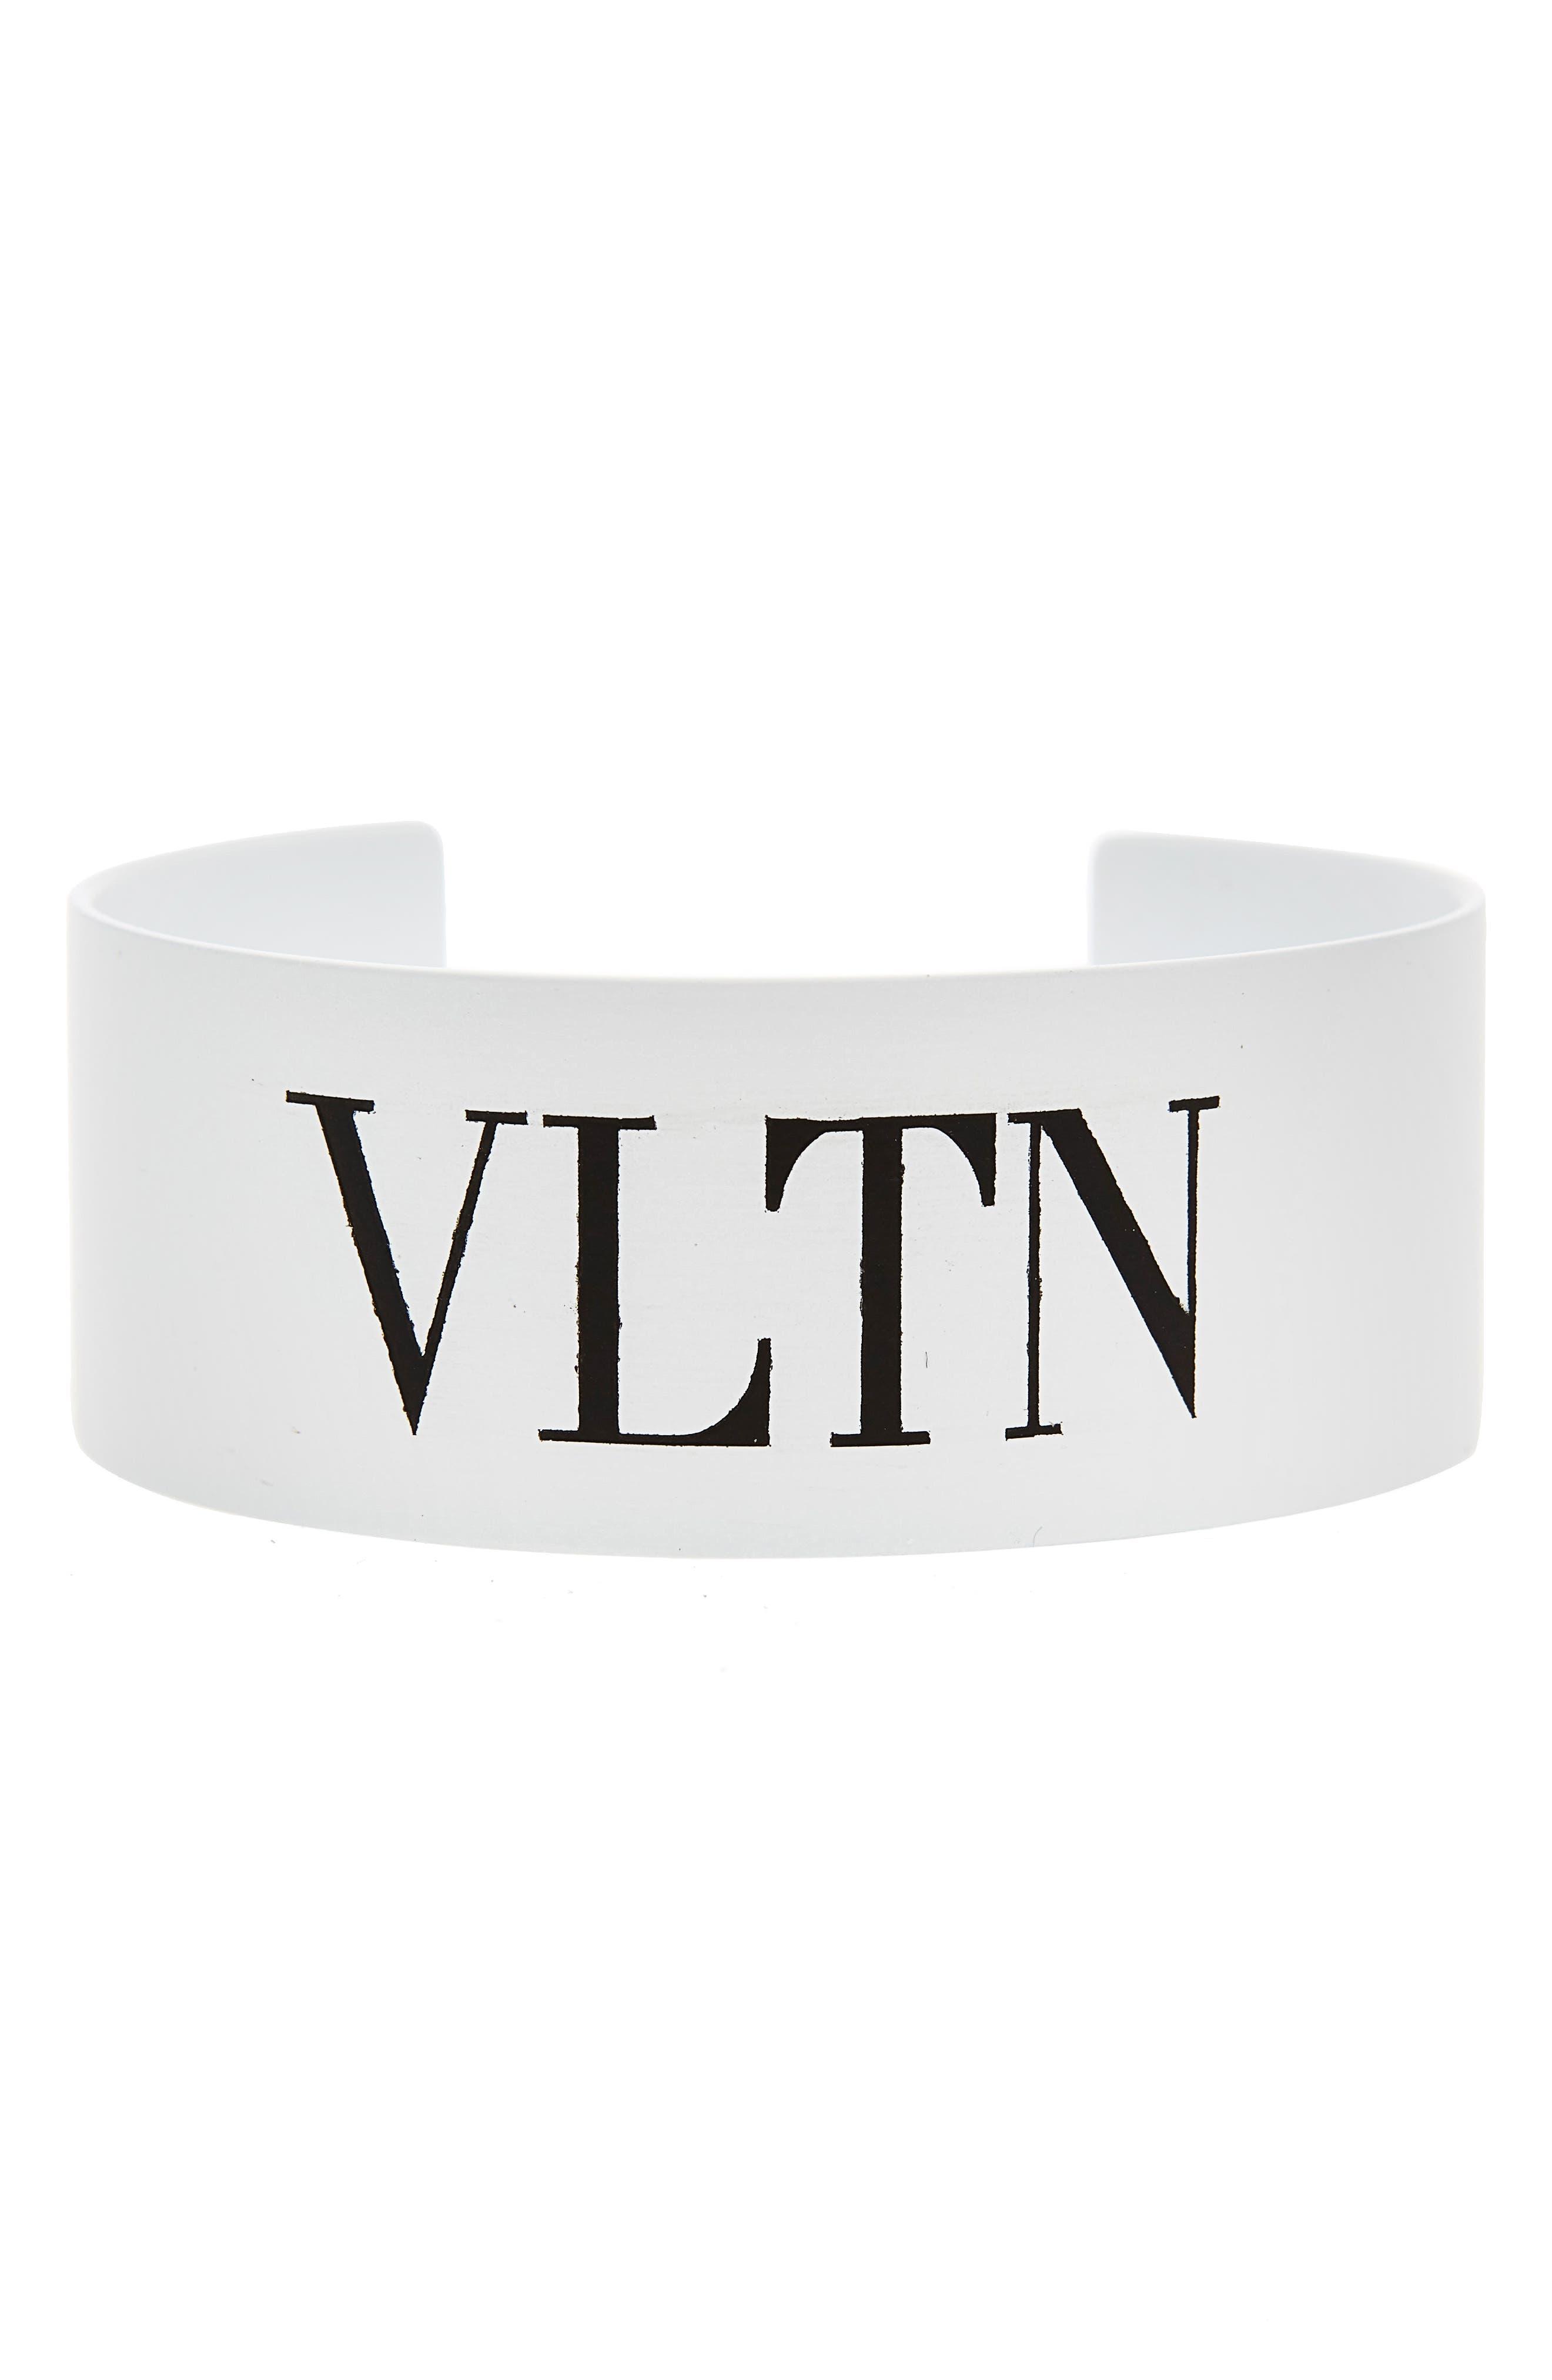 VLTN Medium Cuff Bracelet,                             Main thumbnail 1, color,                             BIANCO/ NERO